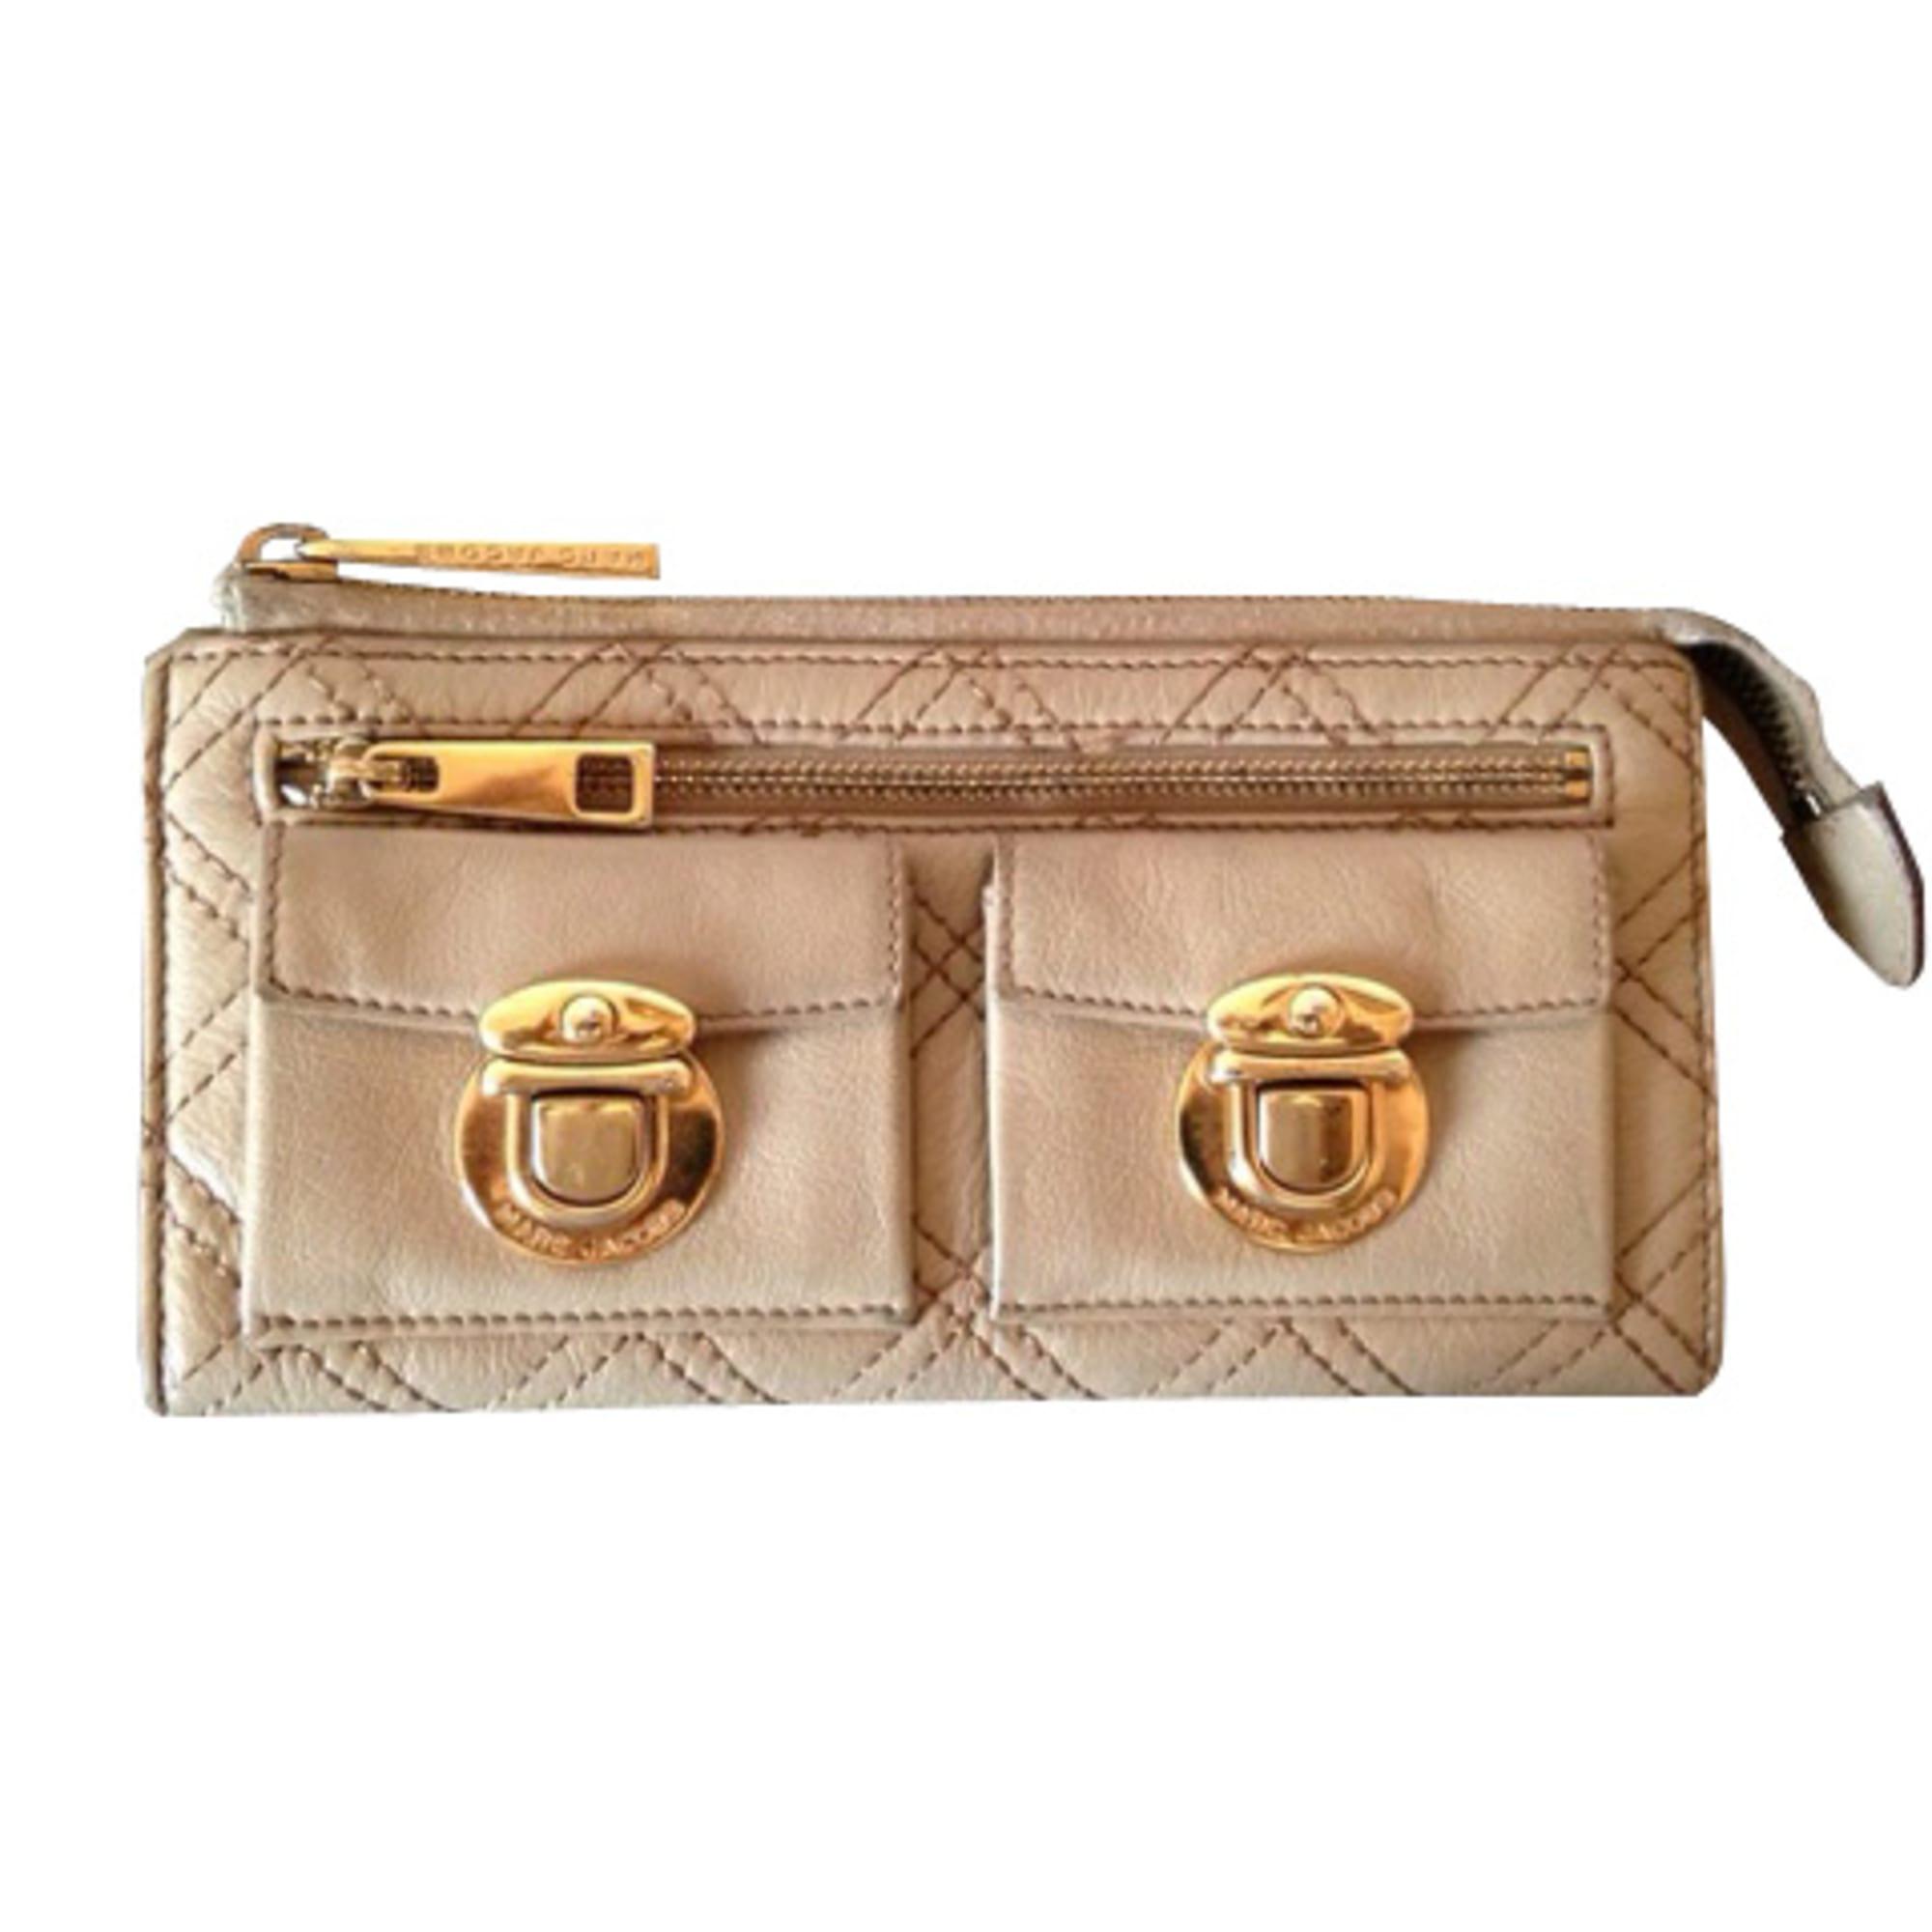 geldbeutel marc jacobs beige vendu par closet2closet 2110282. Black Bedroom Furniture Sets. Home Design Ideas